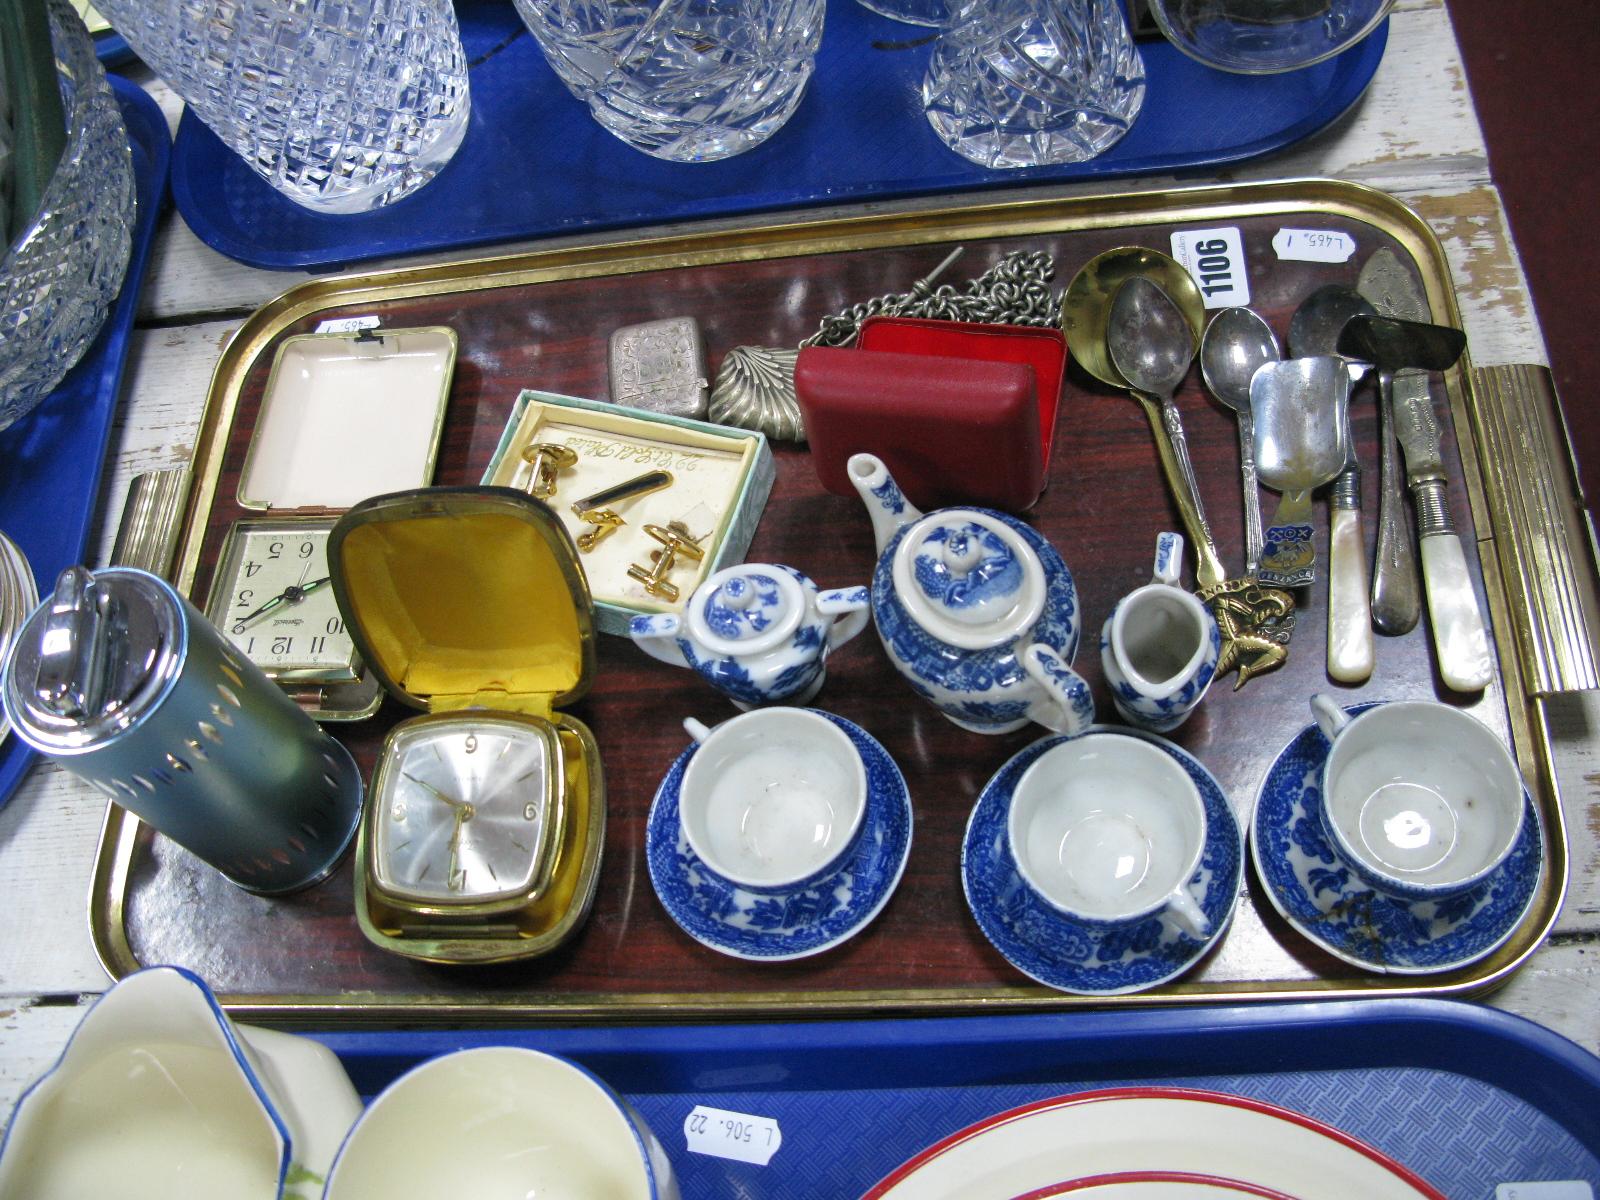 Lot 1106 - Dolls Willow Pattern Tea Set, vesta cases, table top lighter, cufflinks etc:- One Tray